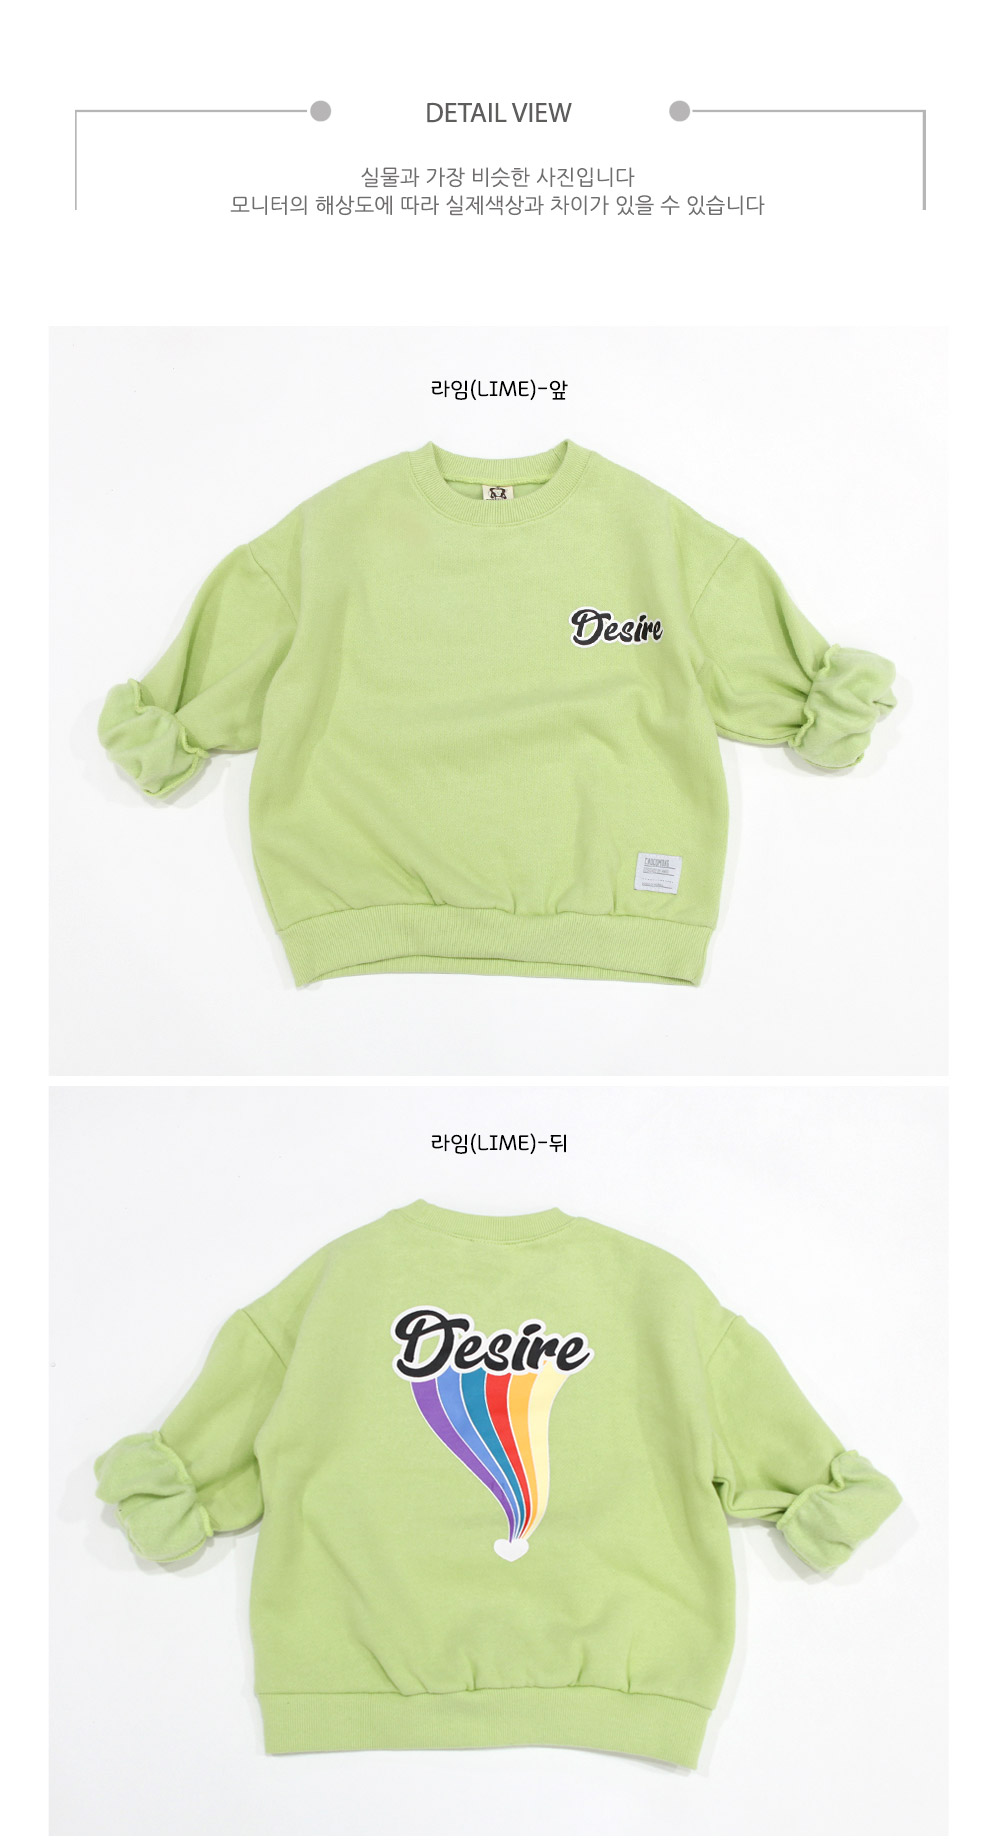 desire_mtm_d_01.jpg